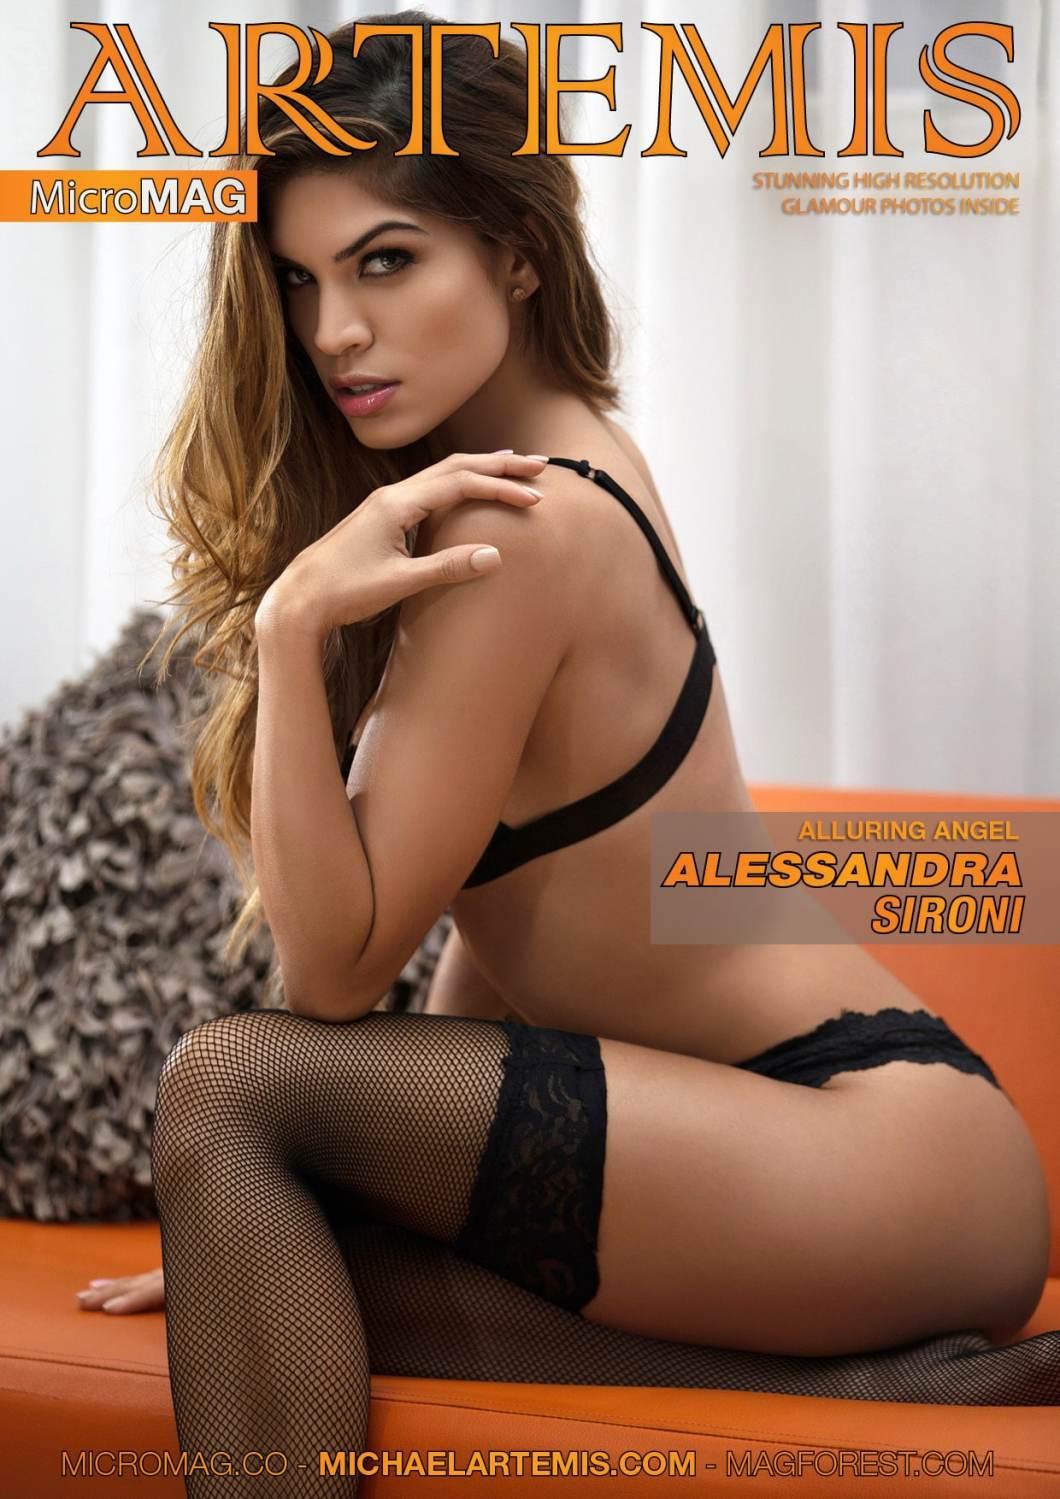 Stunning MicroMAG featuring Alessandra Sironi